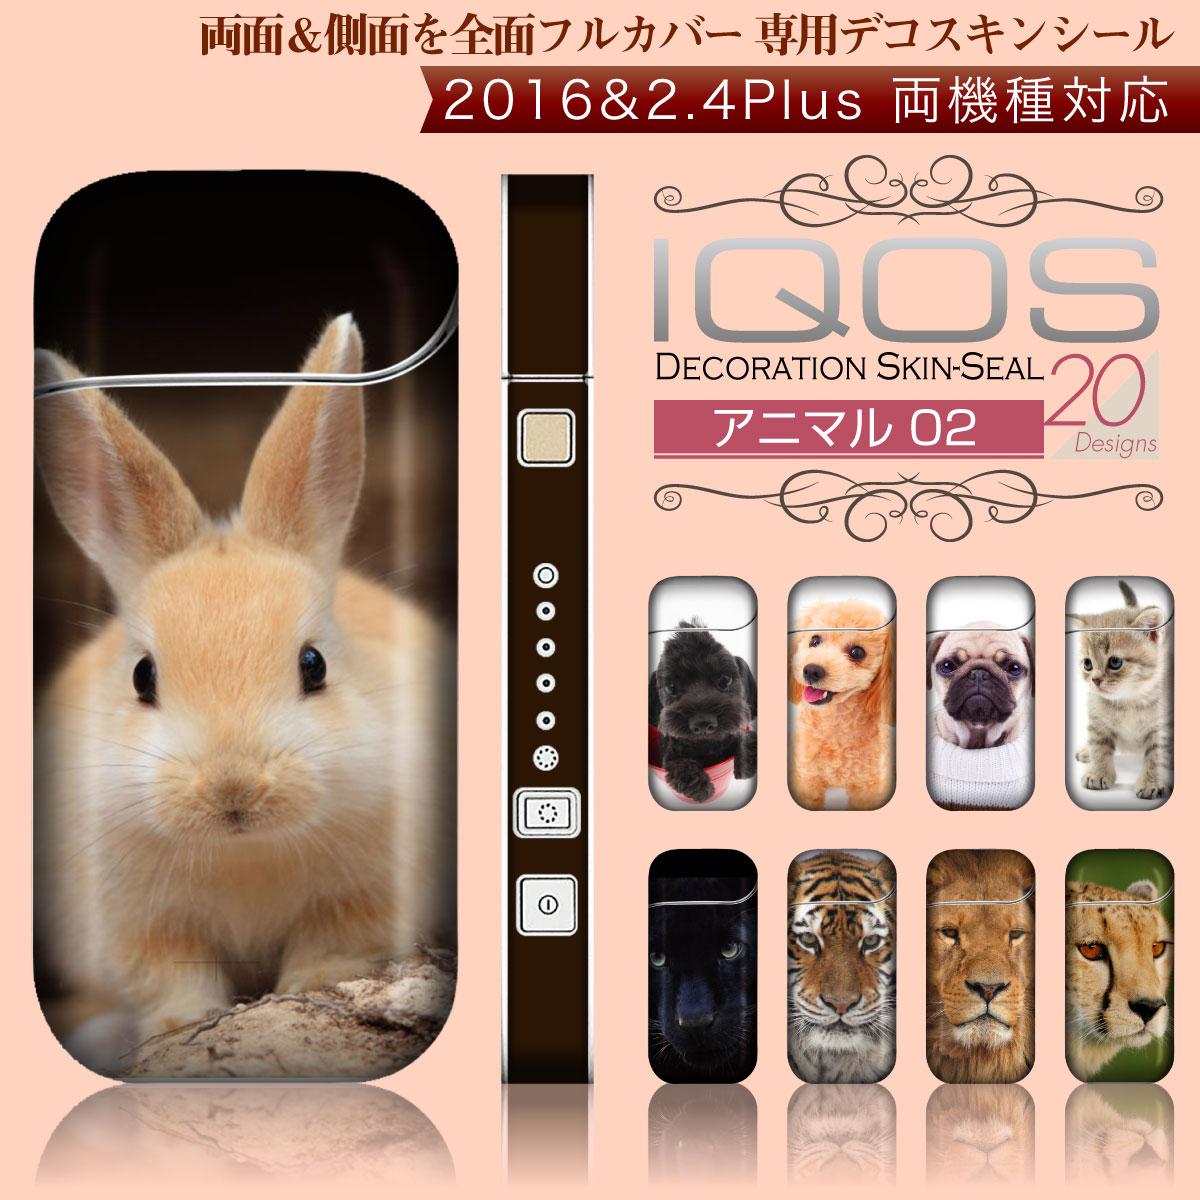 iQOS(アイコス) 専用 デコレーション スキンシール 表面・裏面&側面セット 【 アニマル02柄 シリーズ 】